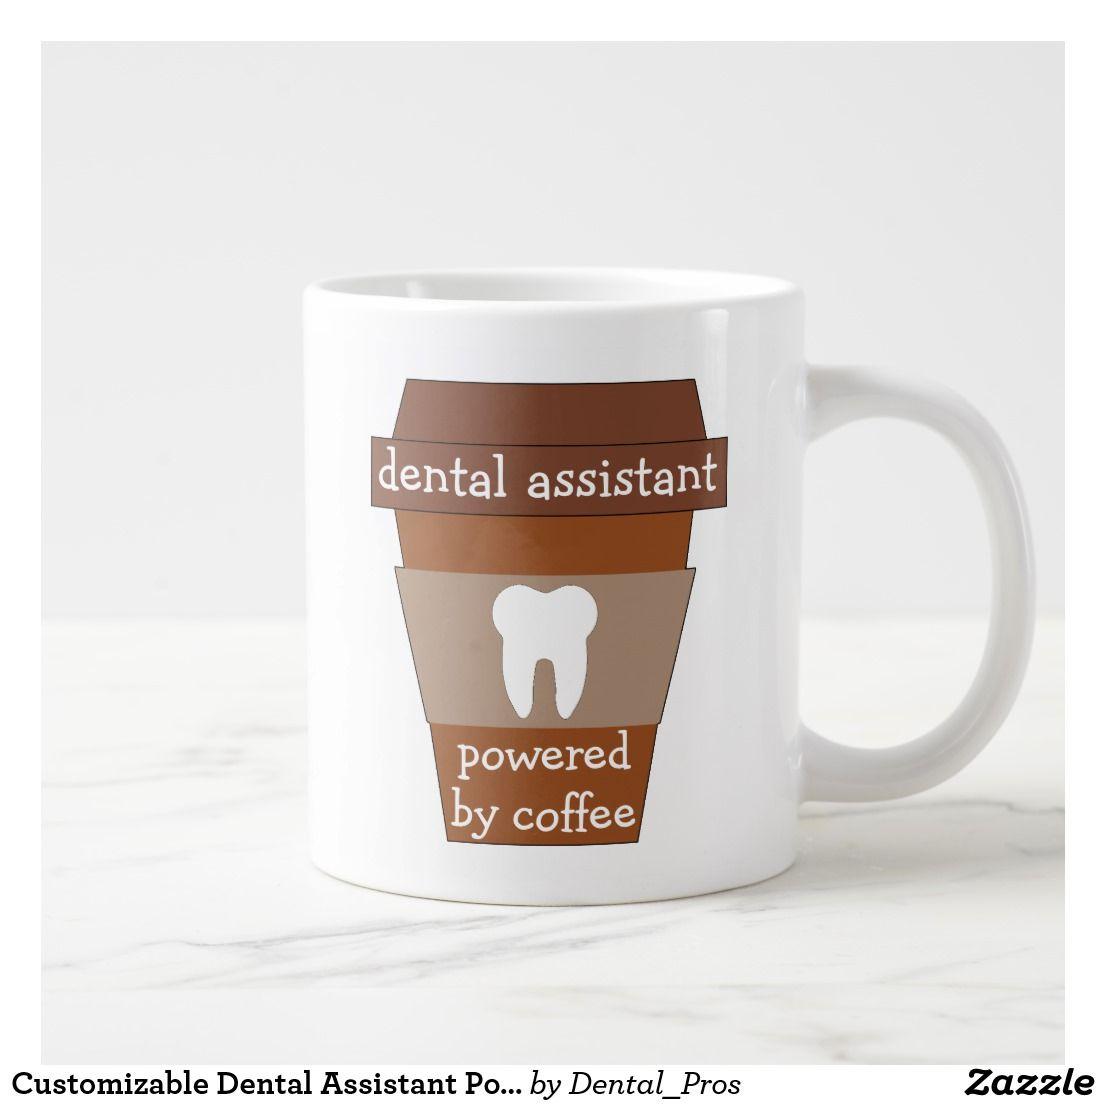 Customizable Dental Assistant Powered By Coffee Giant Coffee Mug | Zazzle.com #mugdisplay